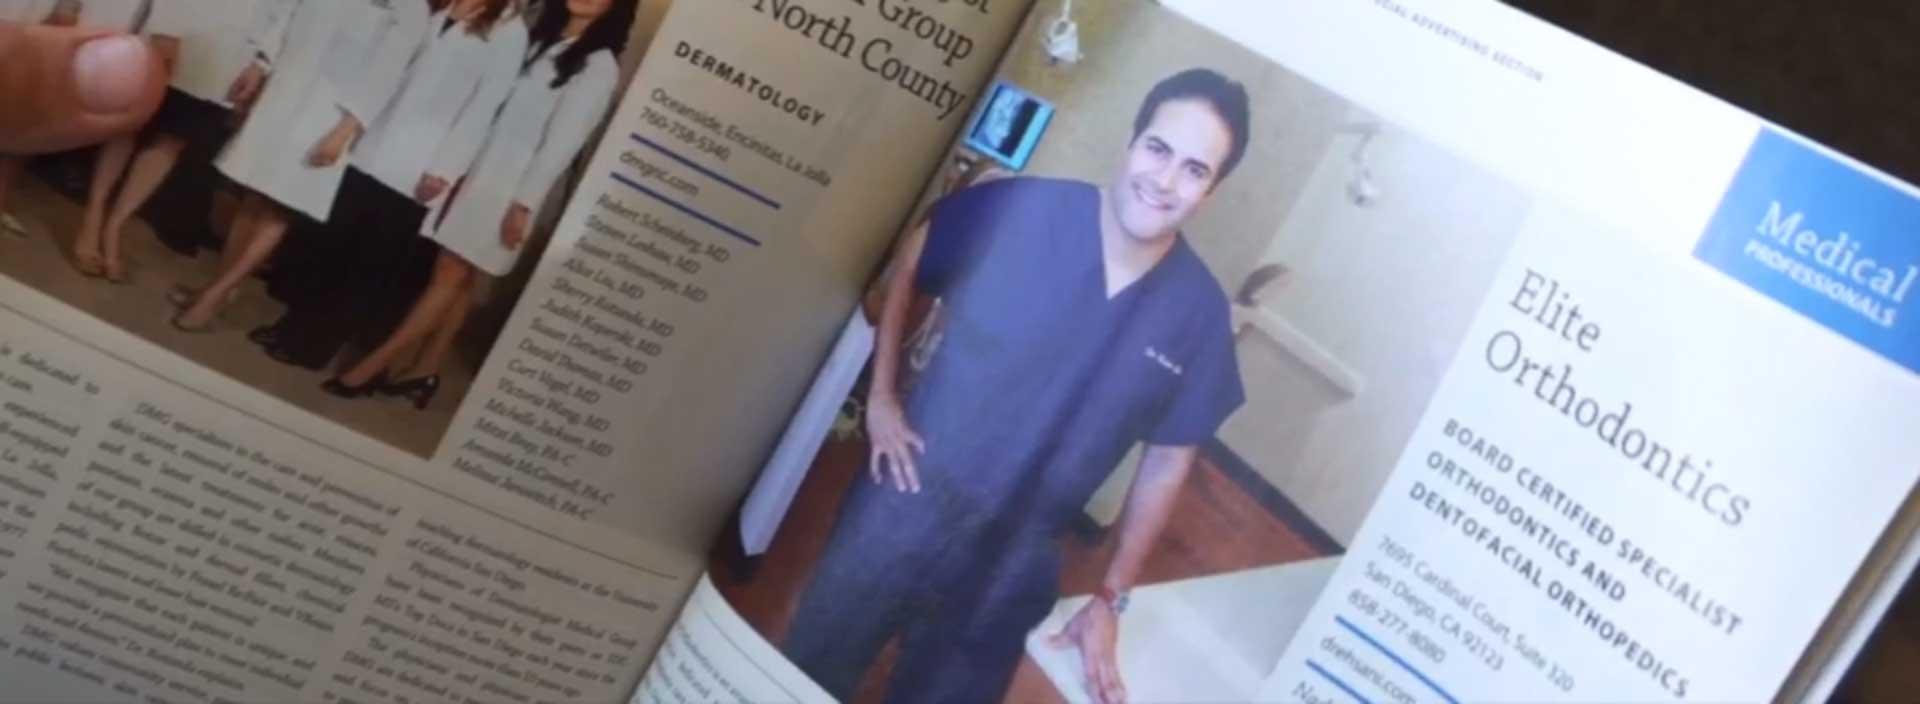 Dr Nader Ehsani Static Image 2 Elite Orthodontics San Diego CA